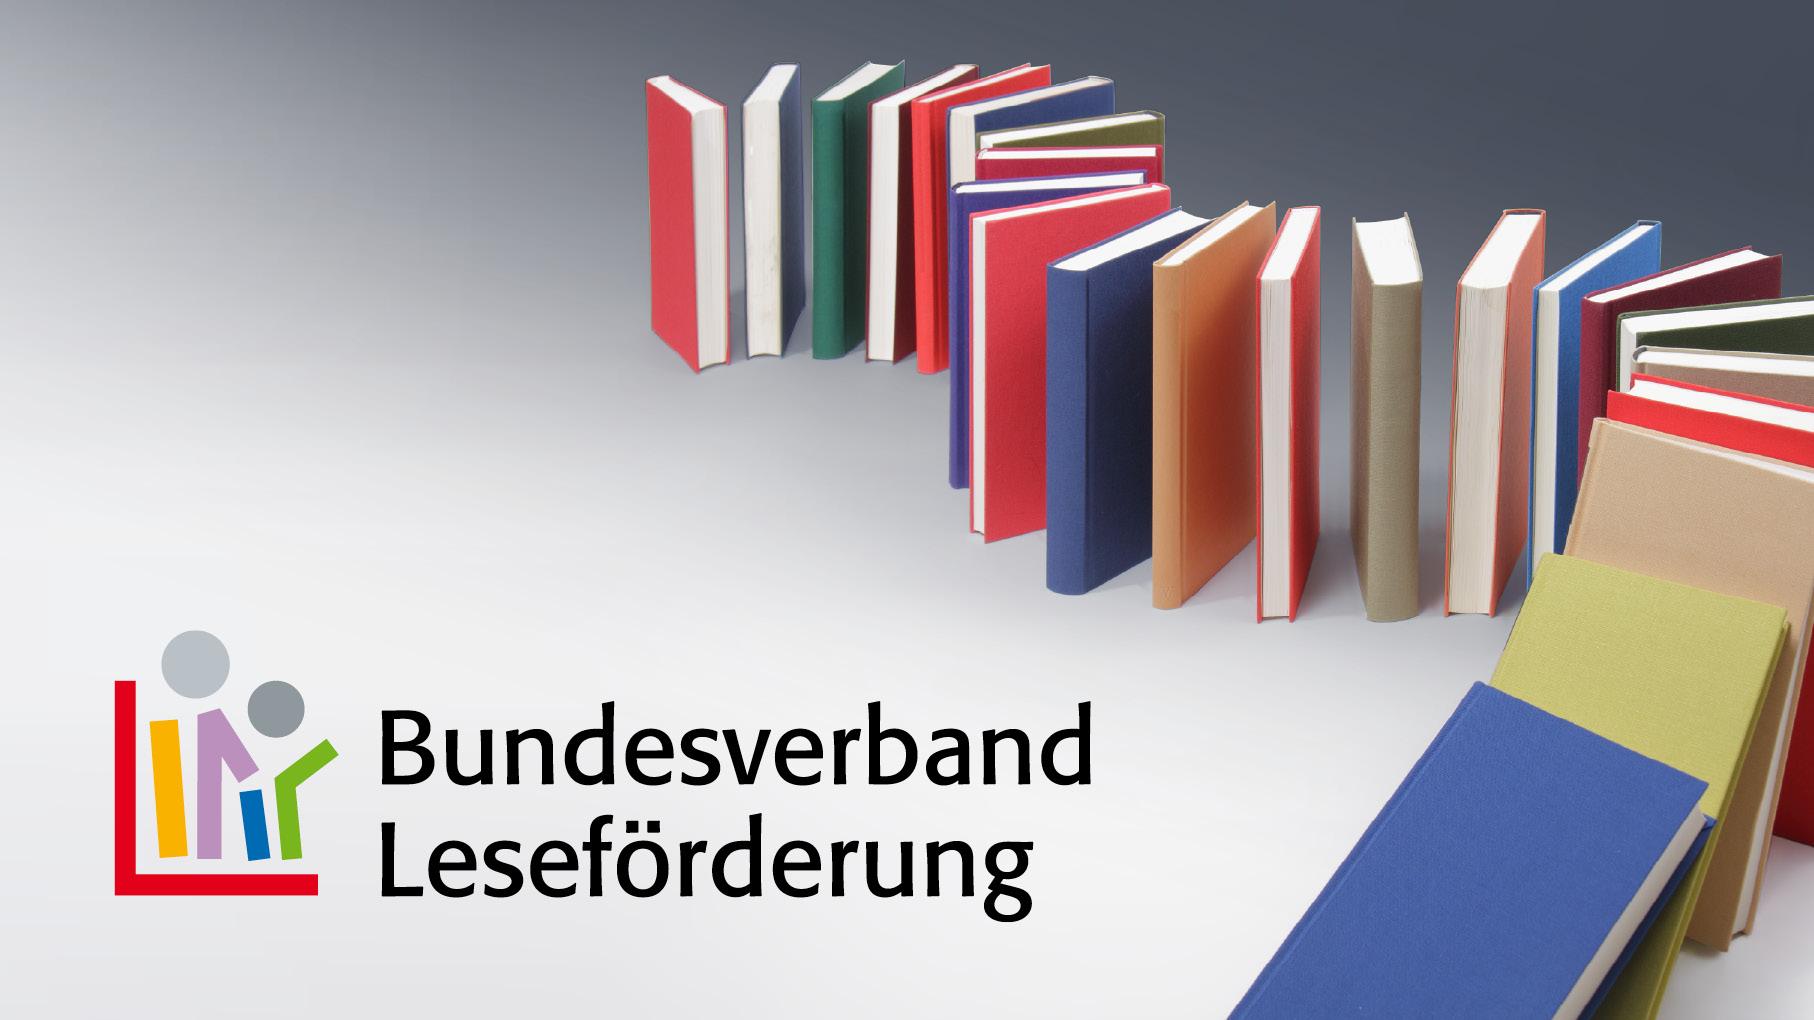 Signet, Web, Print: Bundesverband Leseförderung